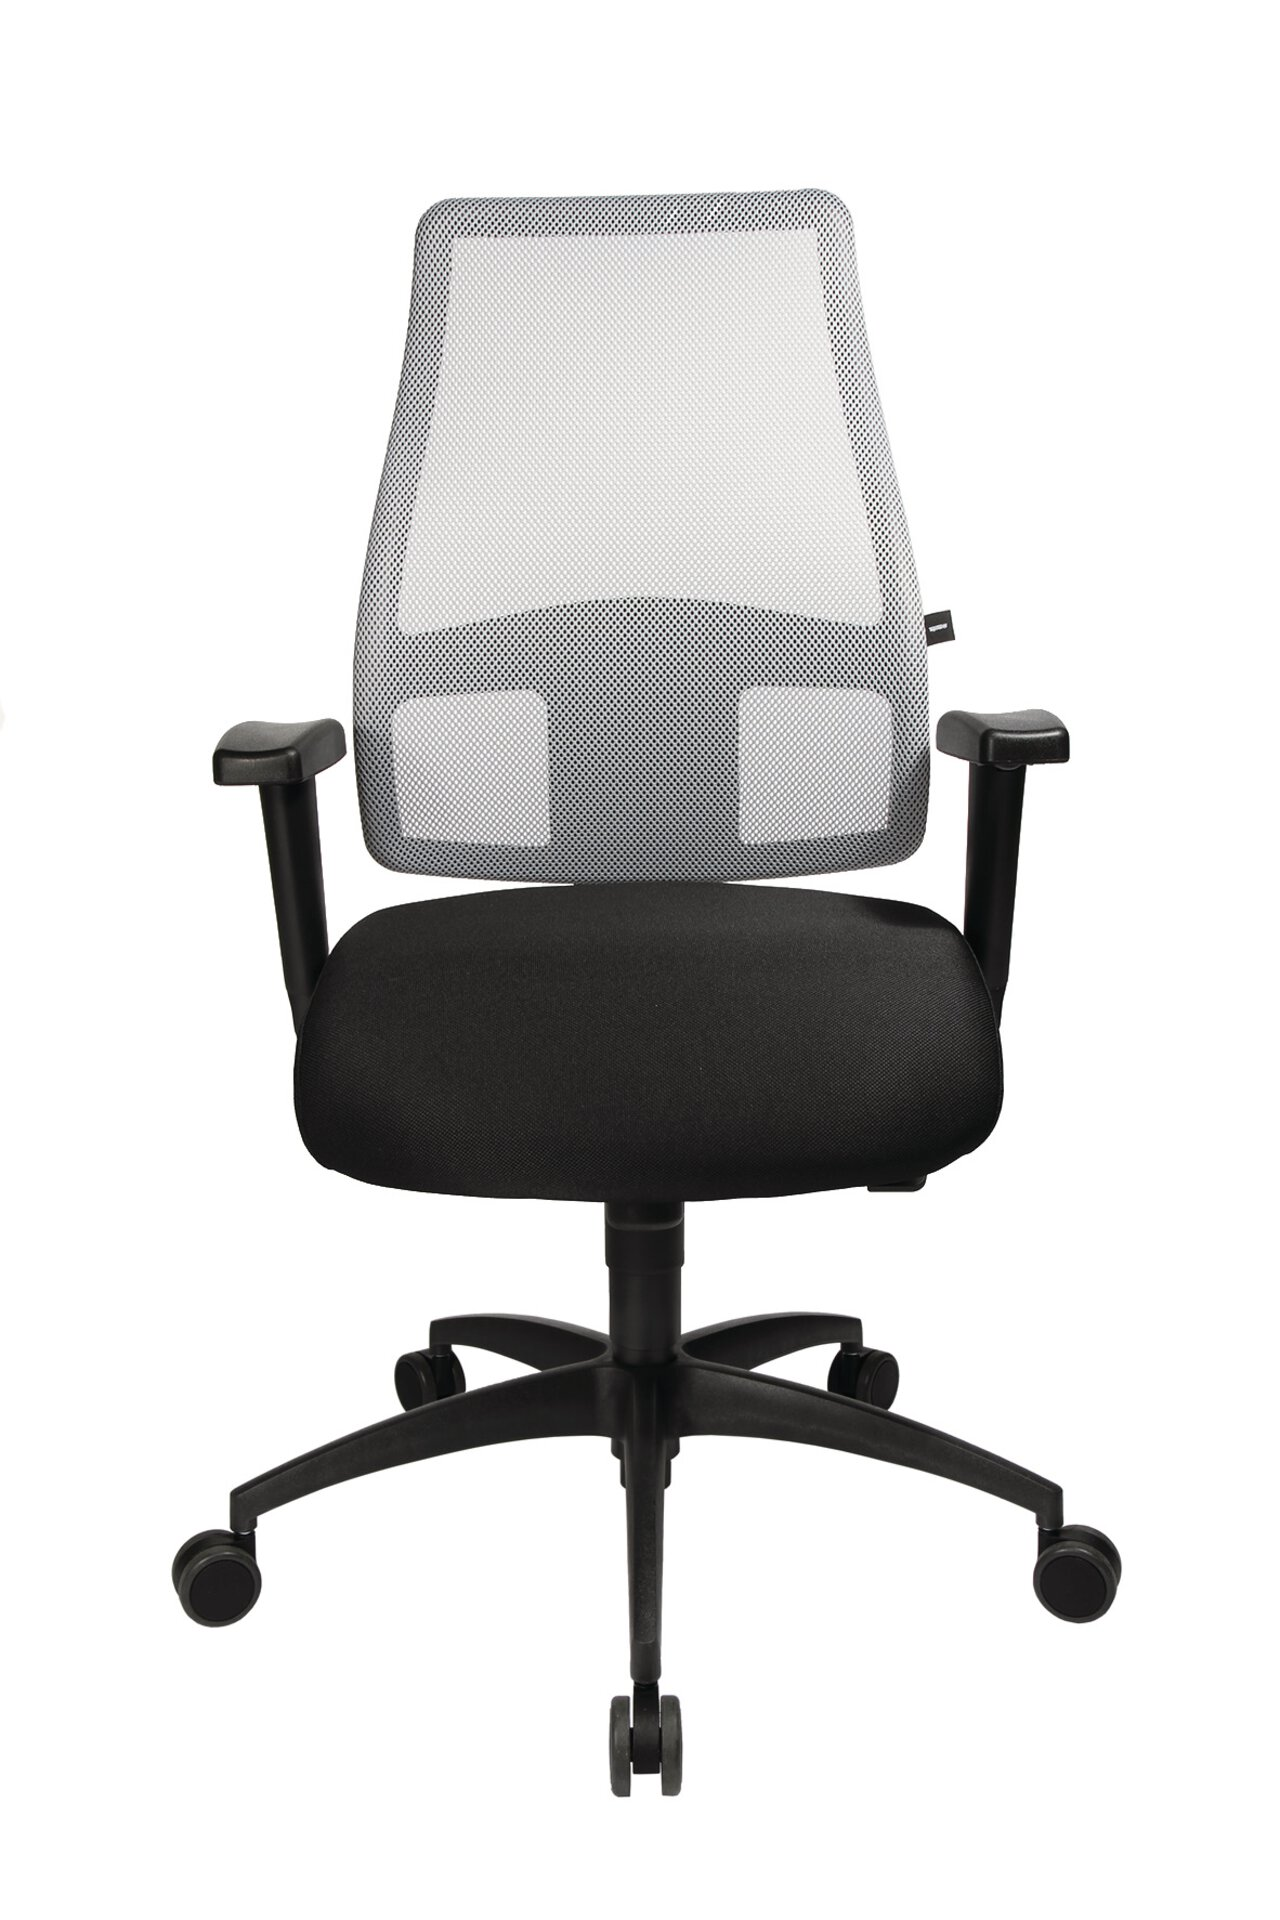 Büro-Drehstuhl COMFORT SY Topstar Textil schwarz 57 x 118 x 58 cm